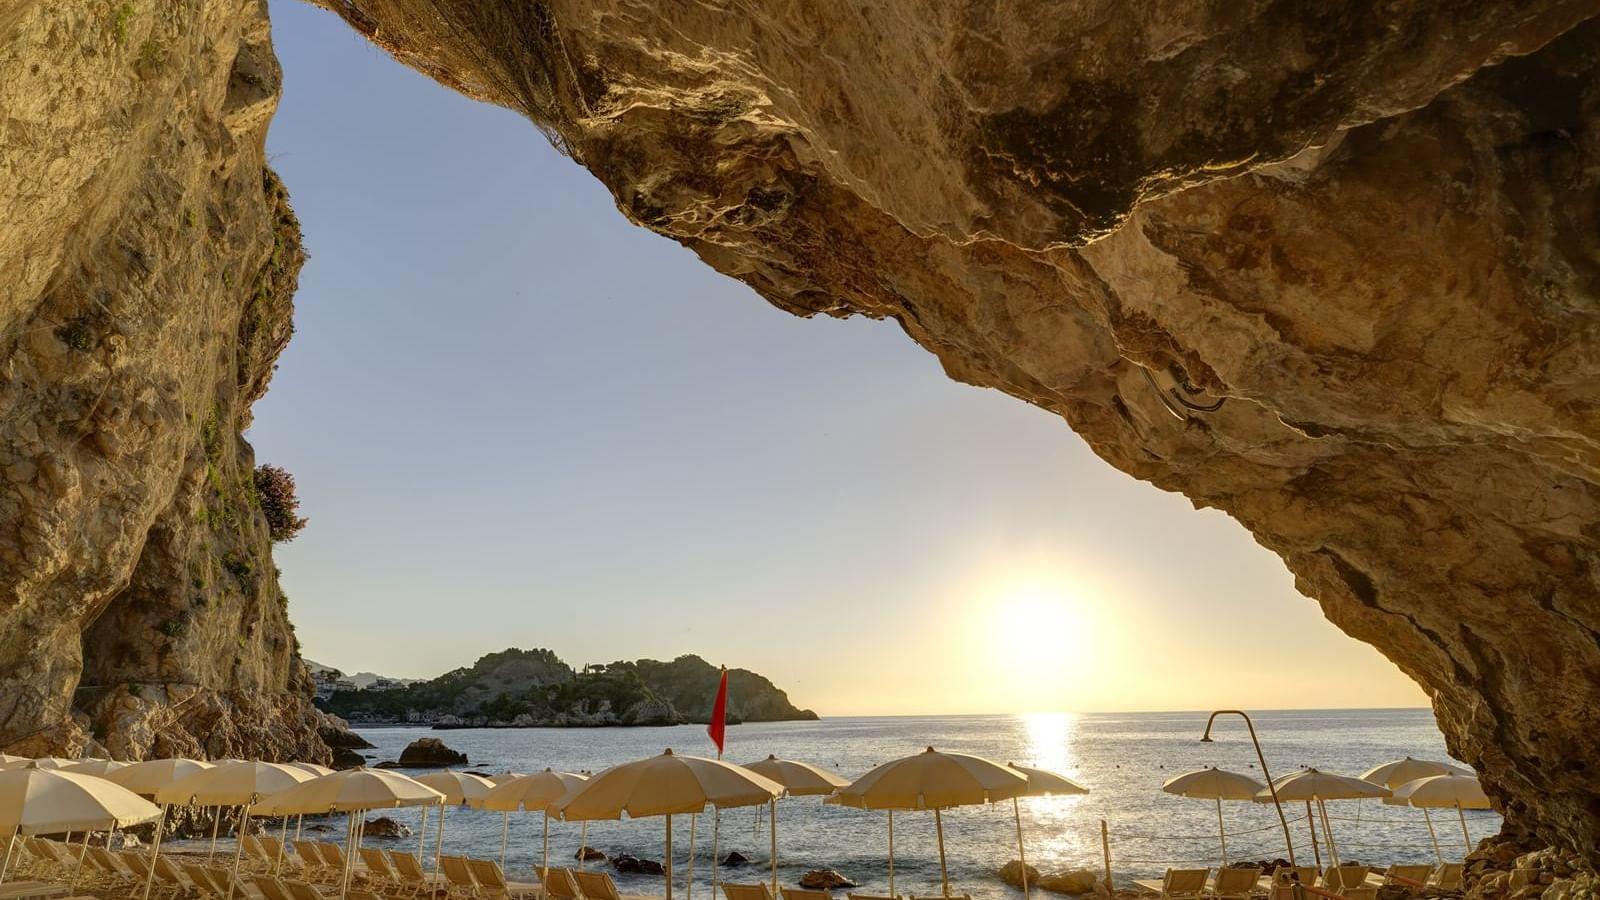 Breathtaking views of the Sicilia coast